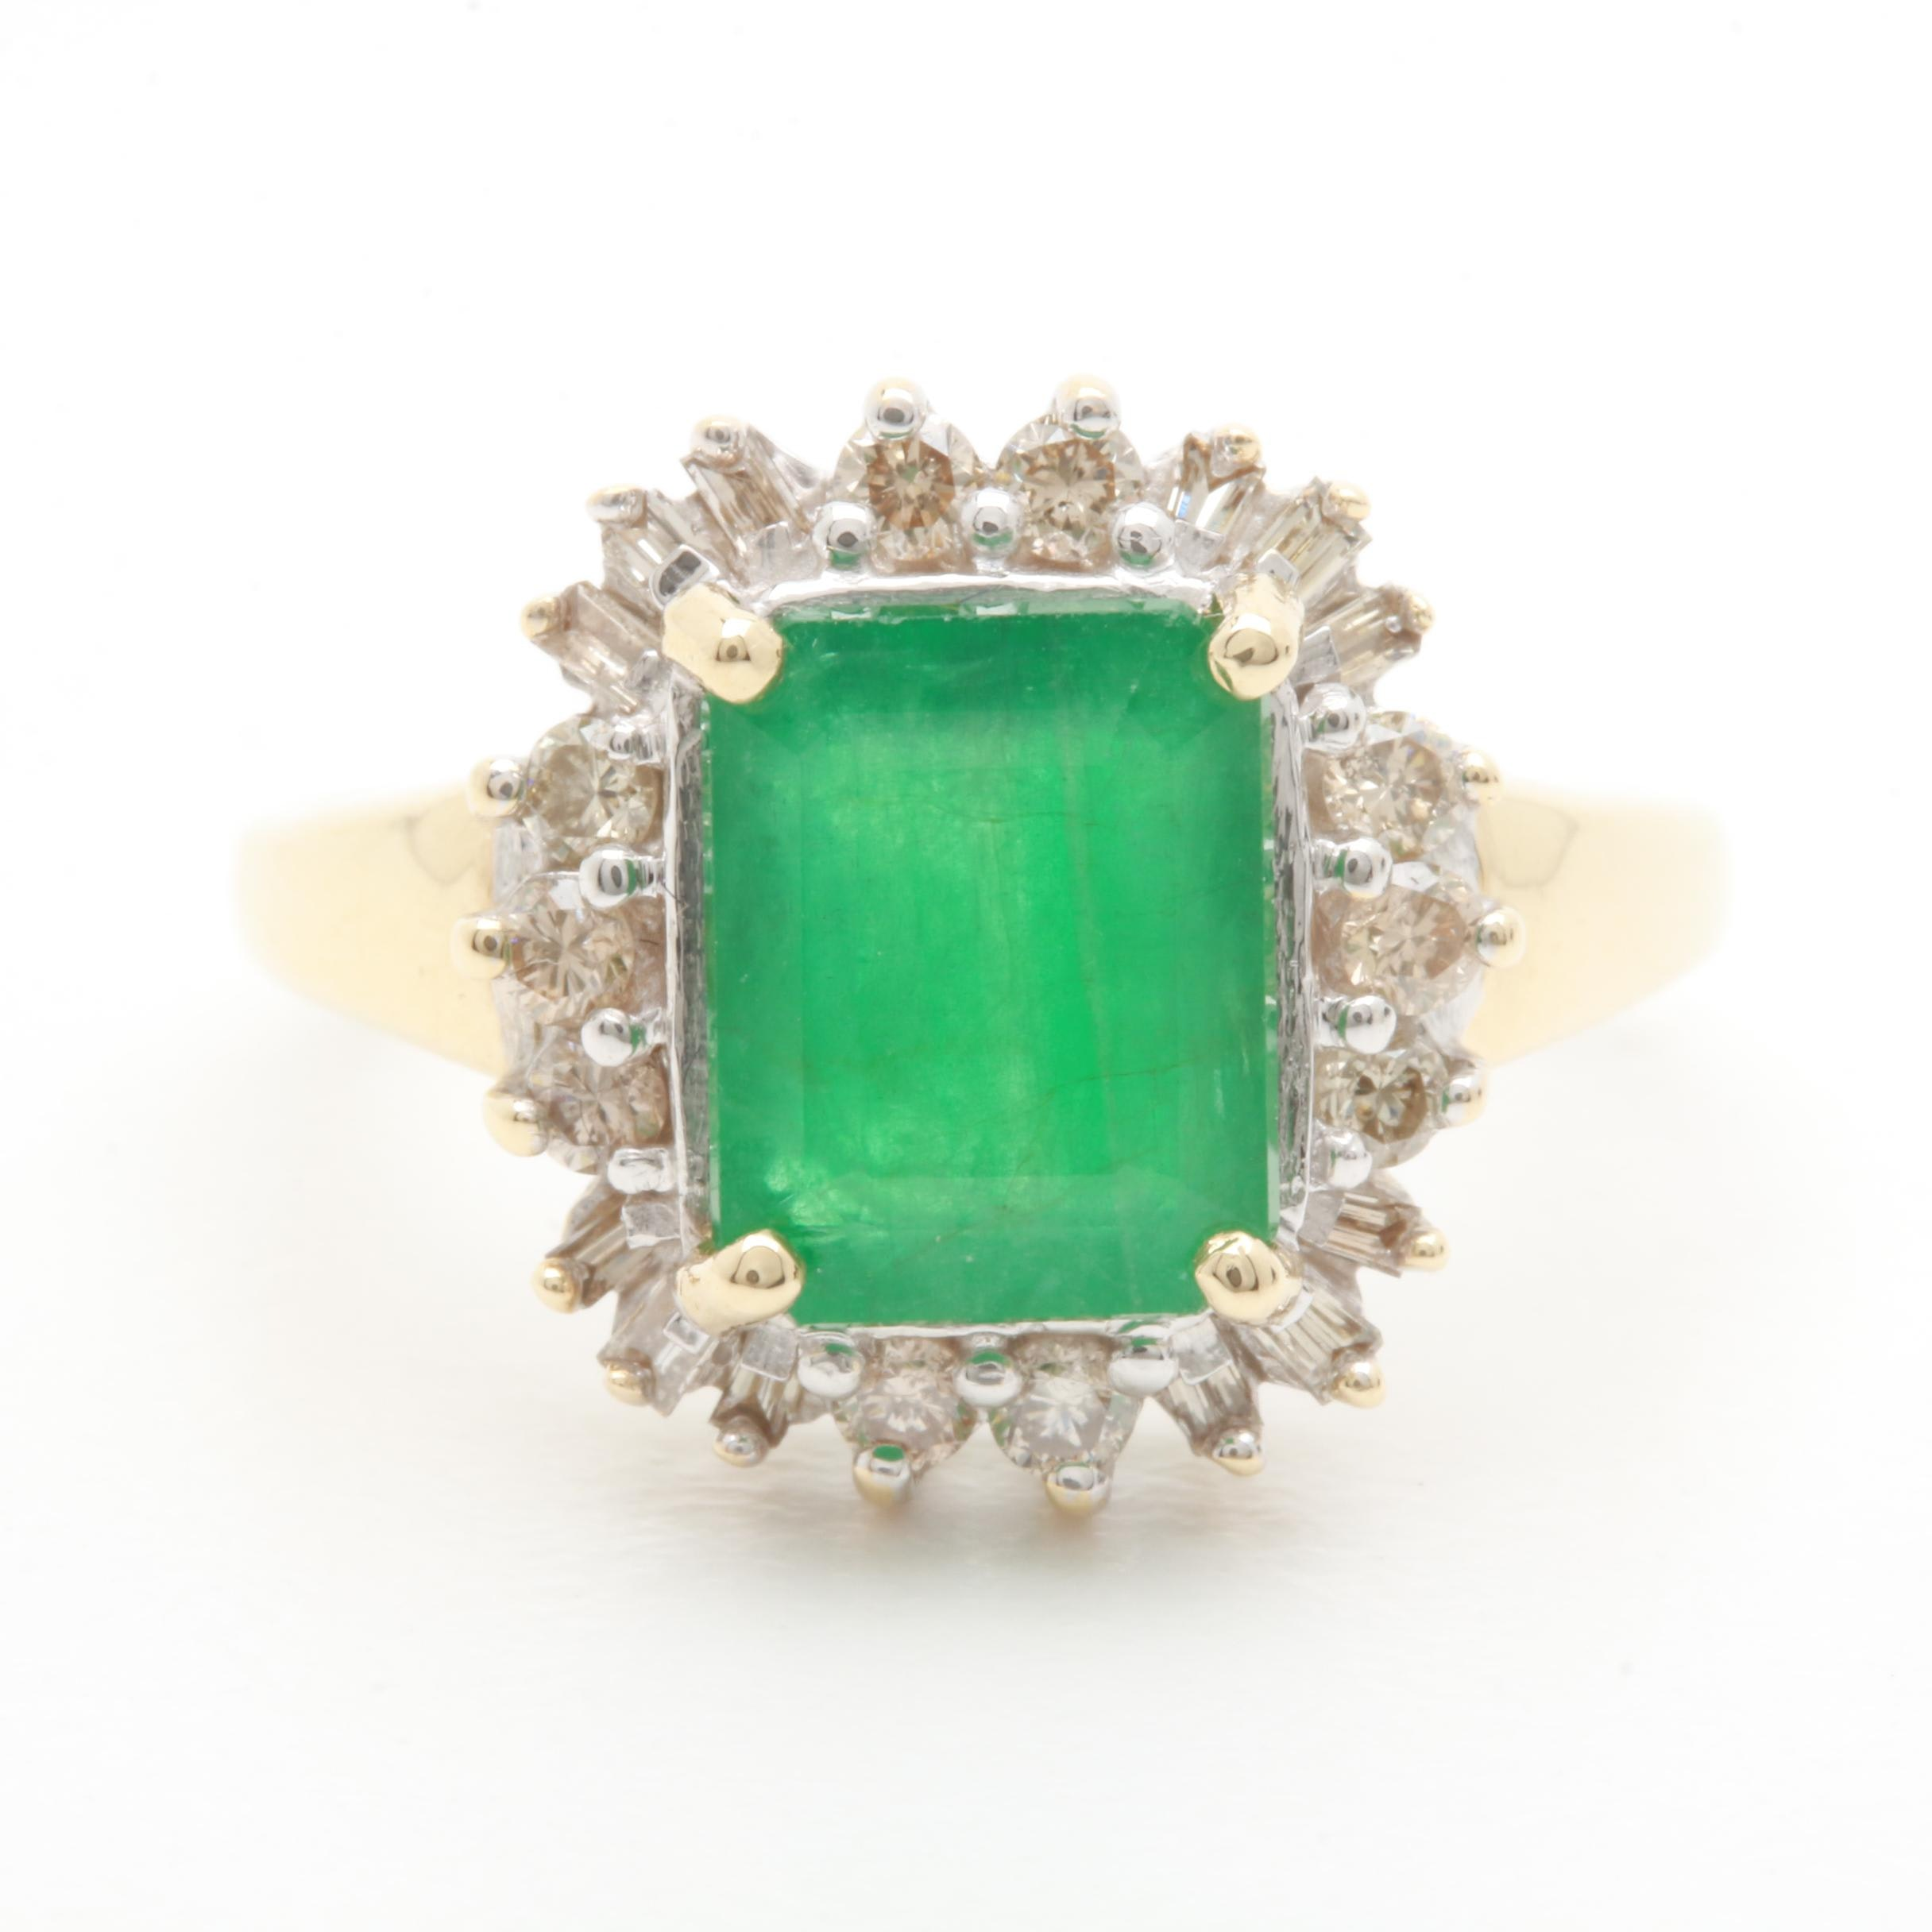 14K Yellow Gold 2.23 CT Emerald and Diamond Ring